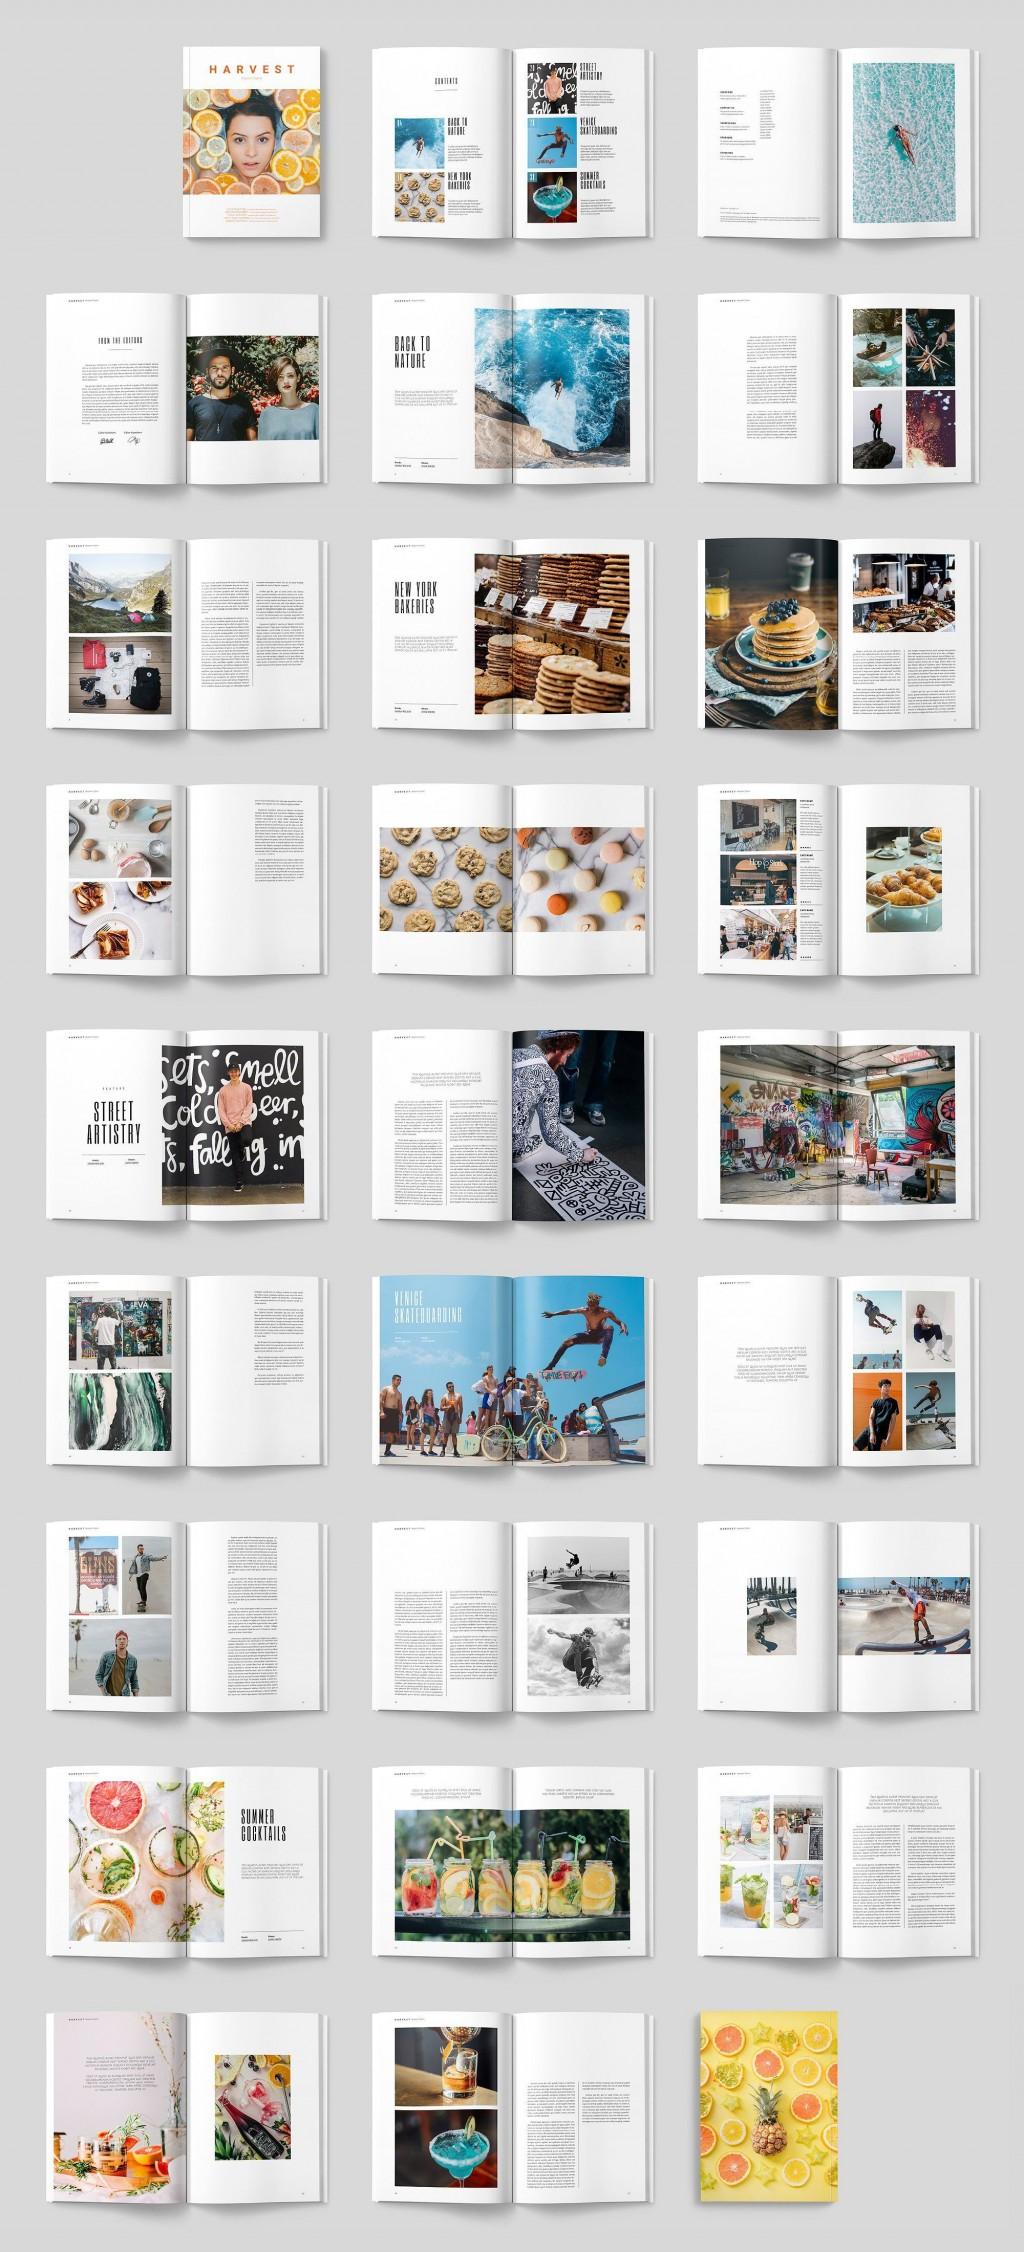 004 Shocking Magazine Template For Microsoft Word Concept  Layout Design DownloadLarge